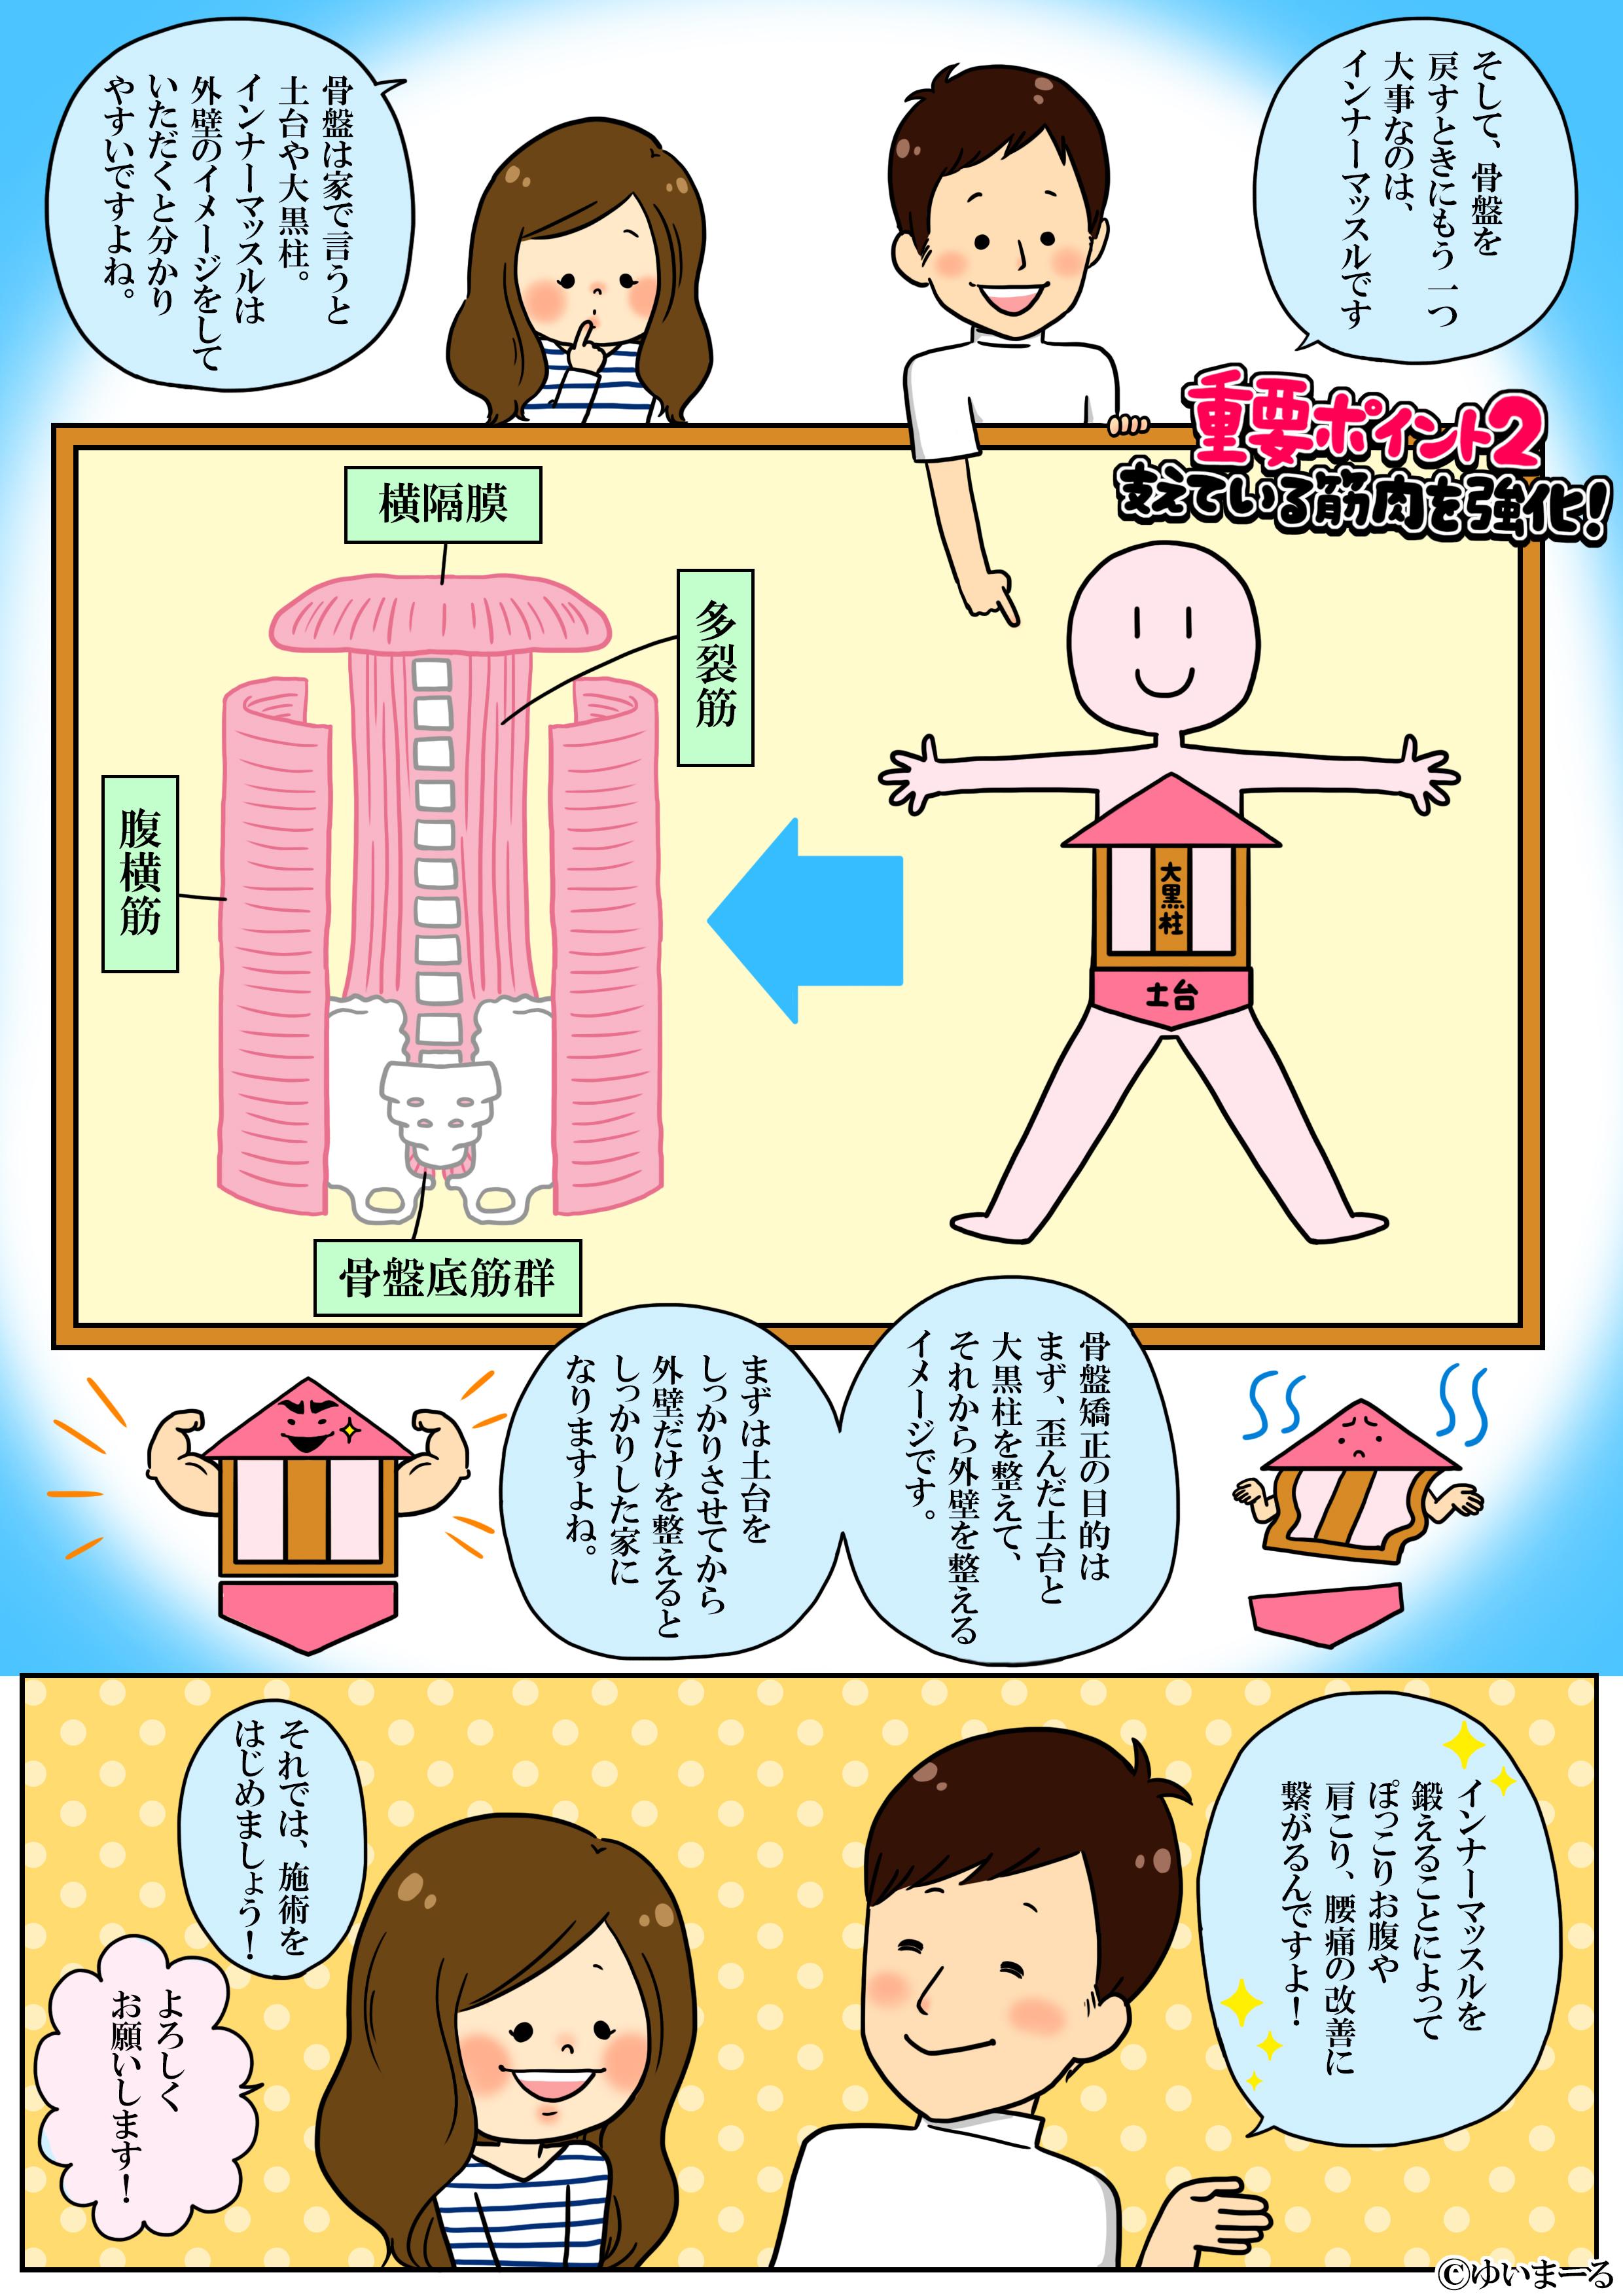 産後の骨盤矯正漫画3